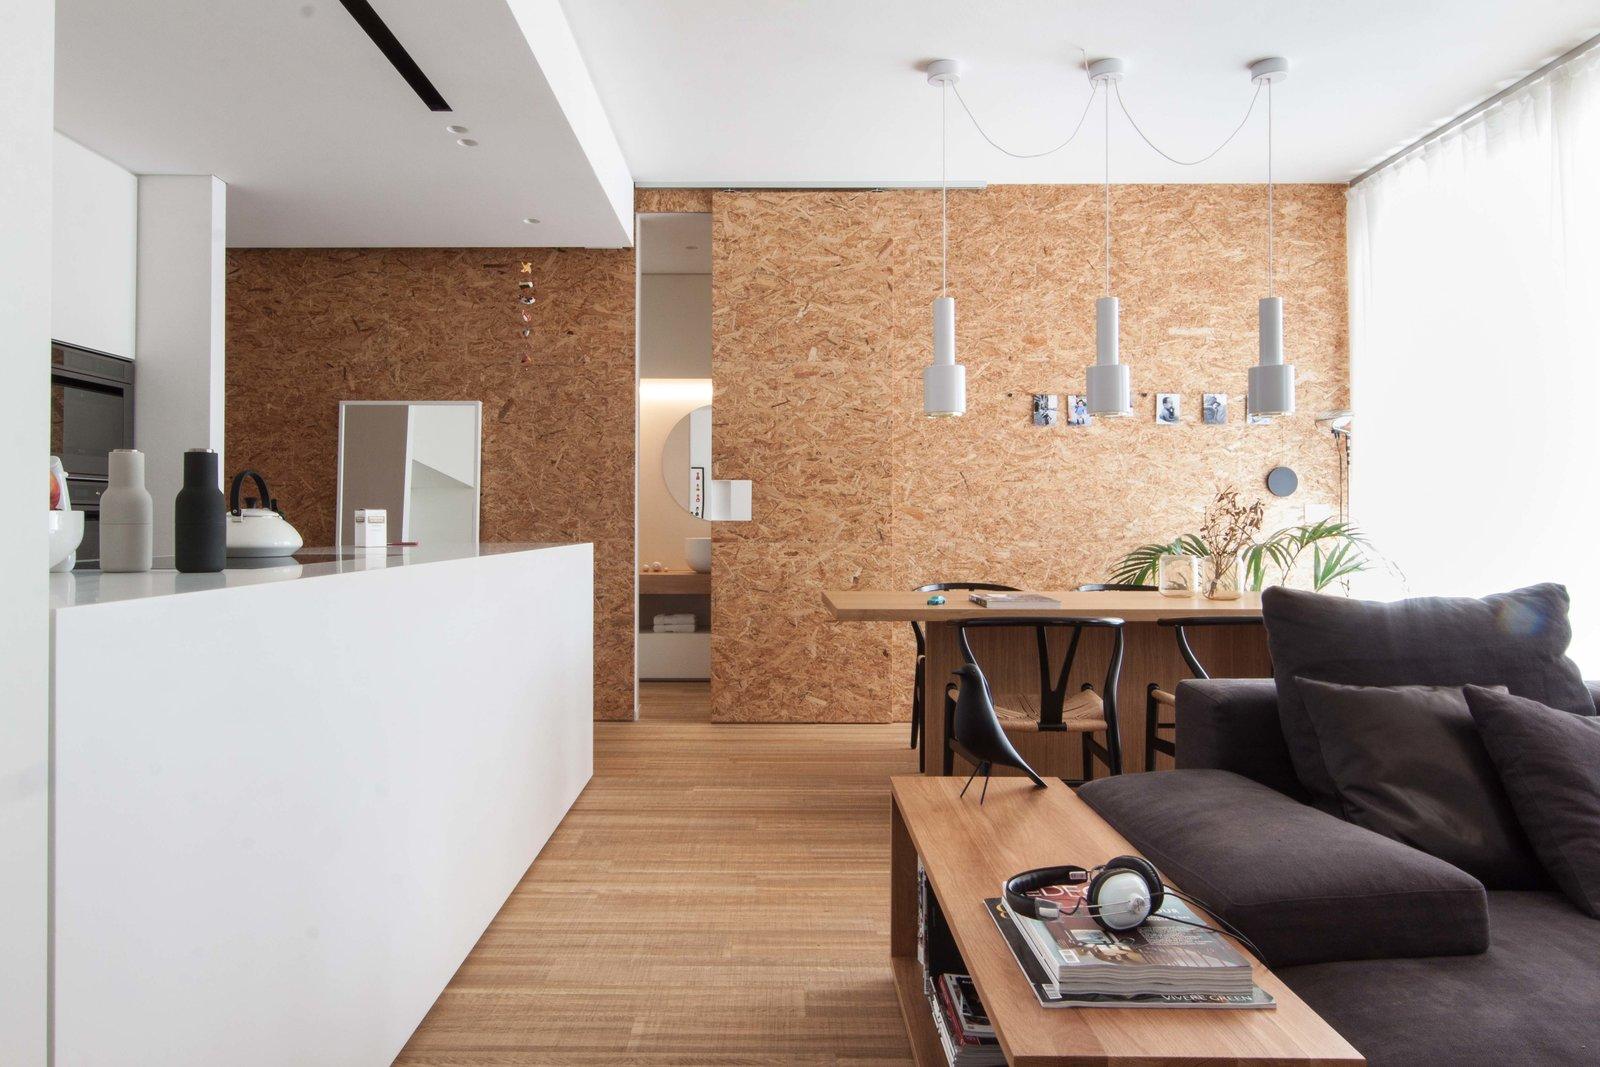 Tagged: Living Room, Sofa, Bench, Chair, Pendant Lighting, Medium Hardwood Floor, Table, and Ceiling Lighting.  Interior LP by Didonè Comacchio